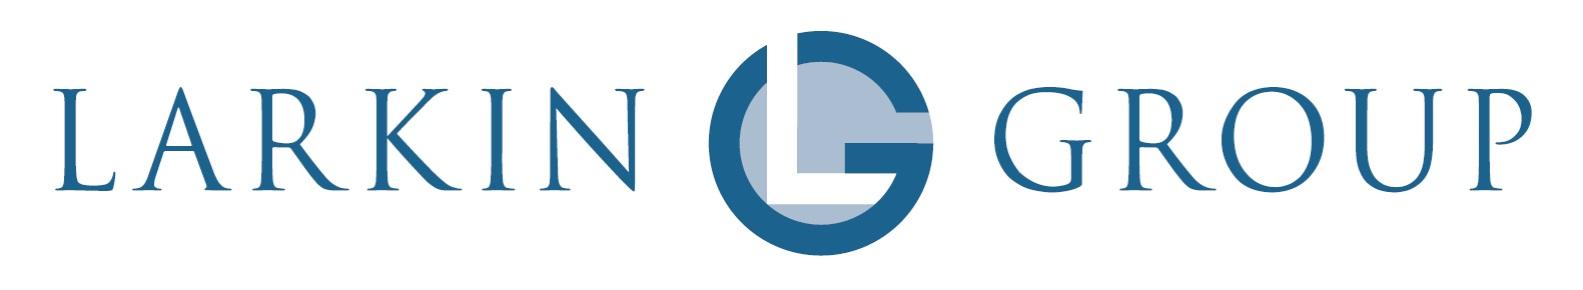 Larkin Group